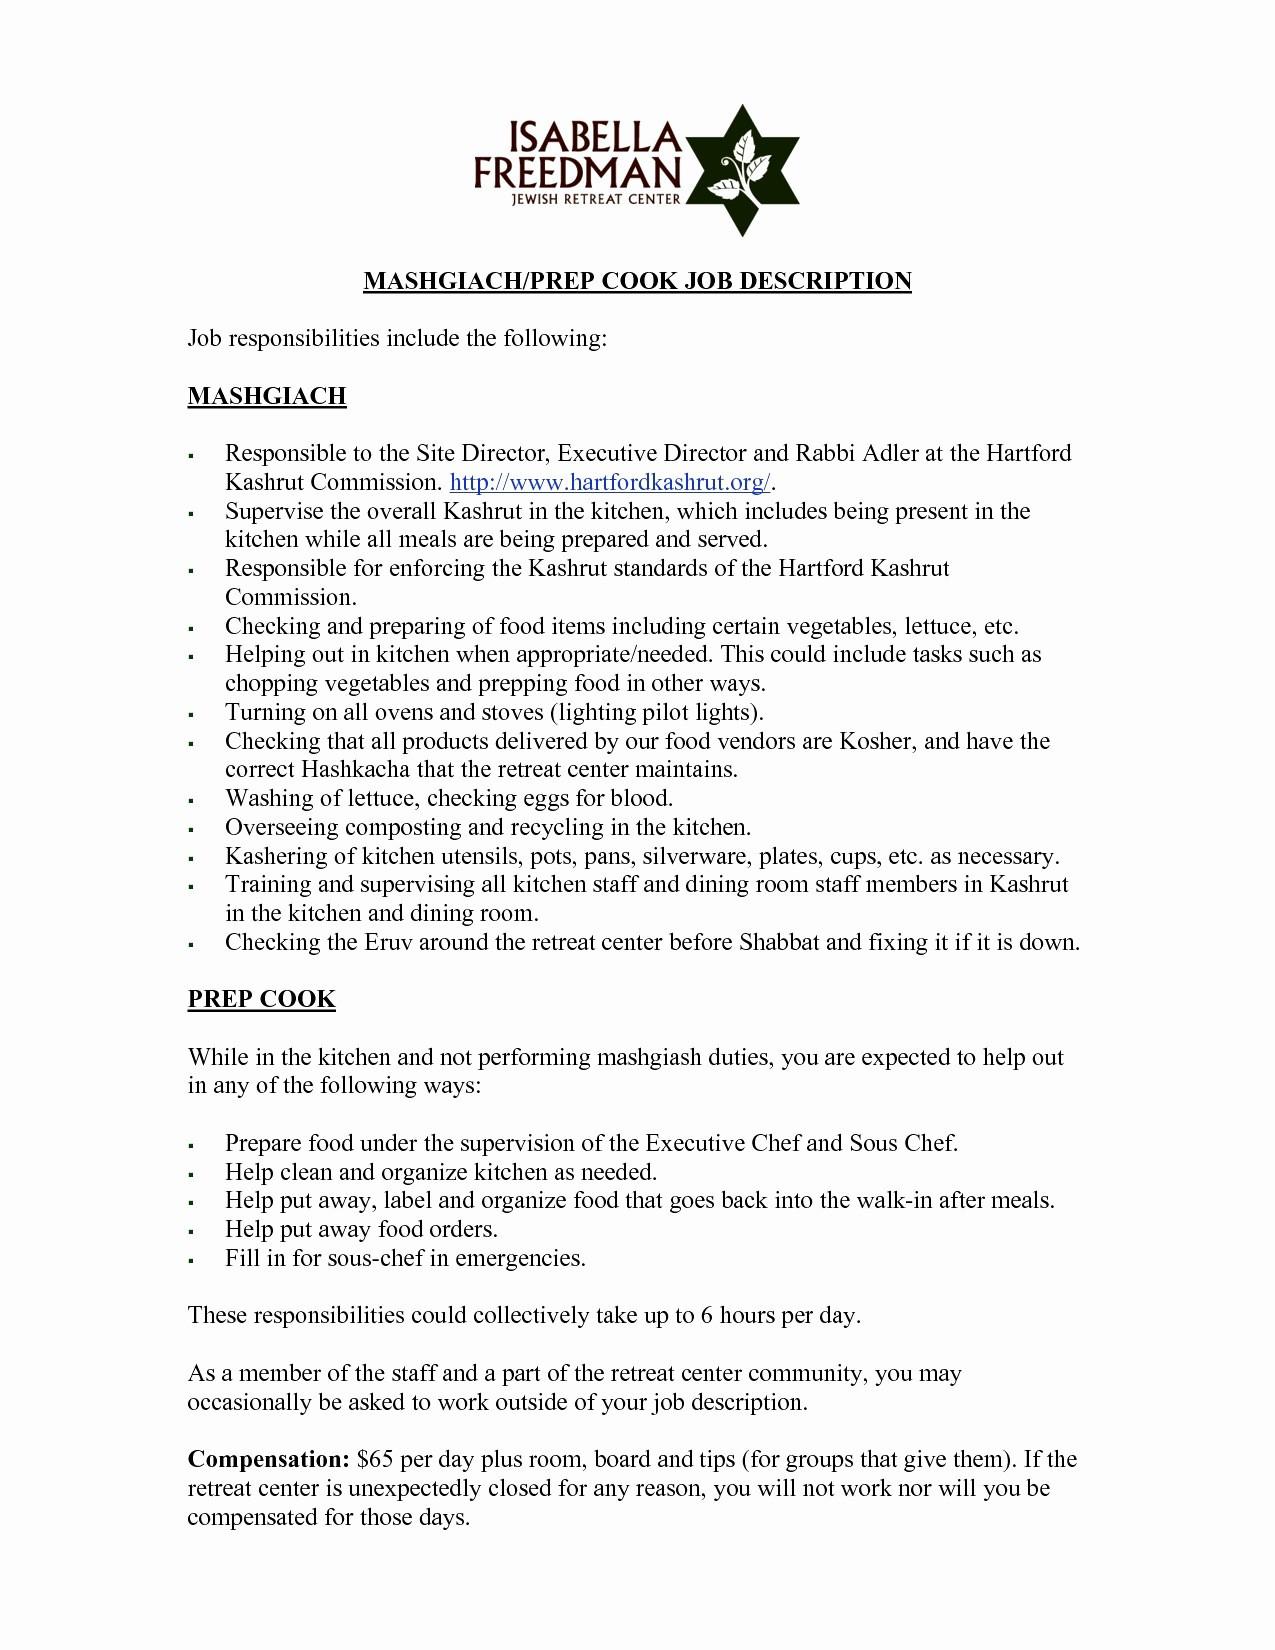 Sample Letter Template - Cover Letter Job Sample Fresh Resume Doc Template Luxury Resume and